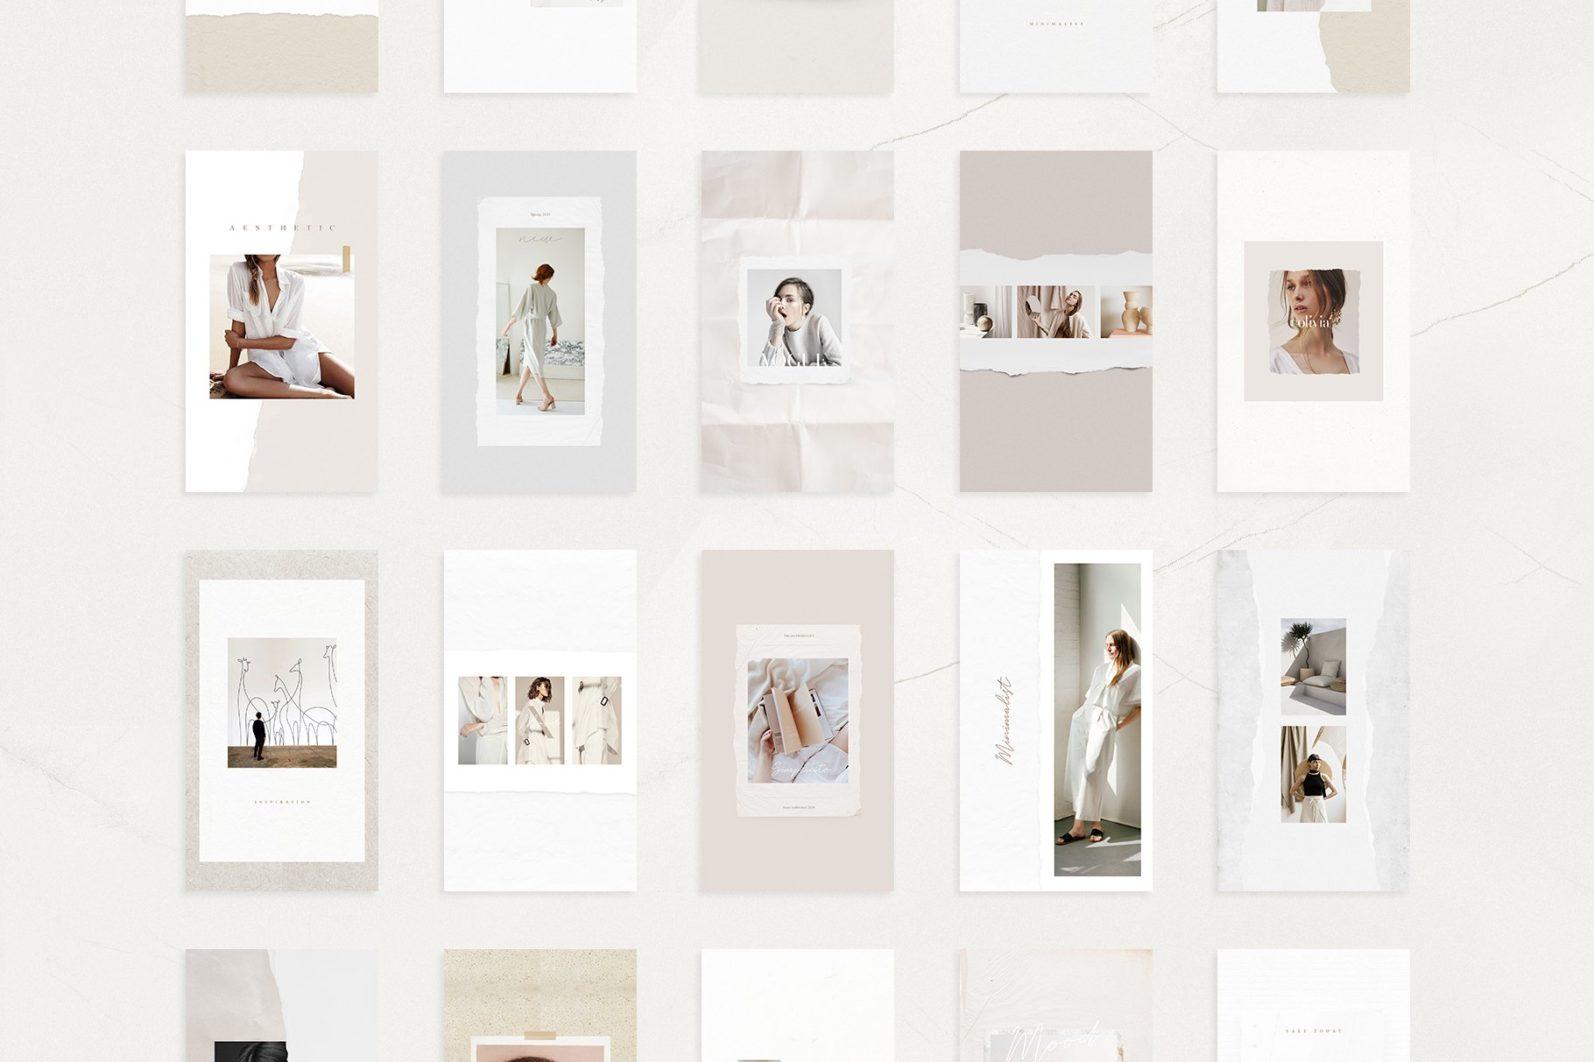 Señorita - Instagram Stories & Post - noir7 -